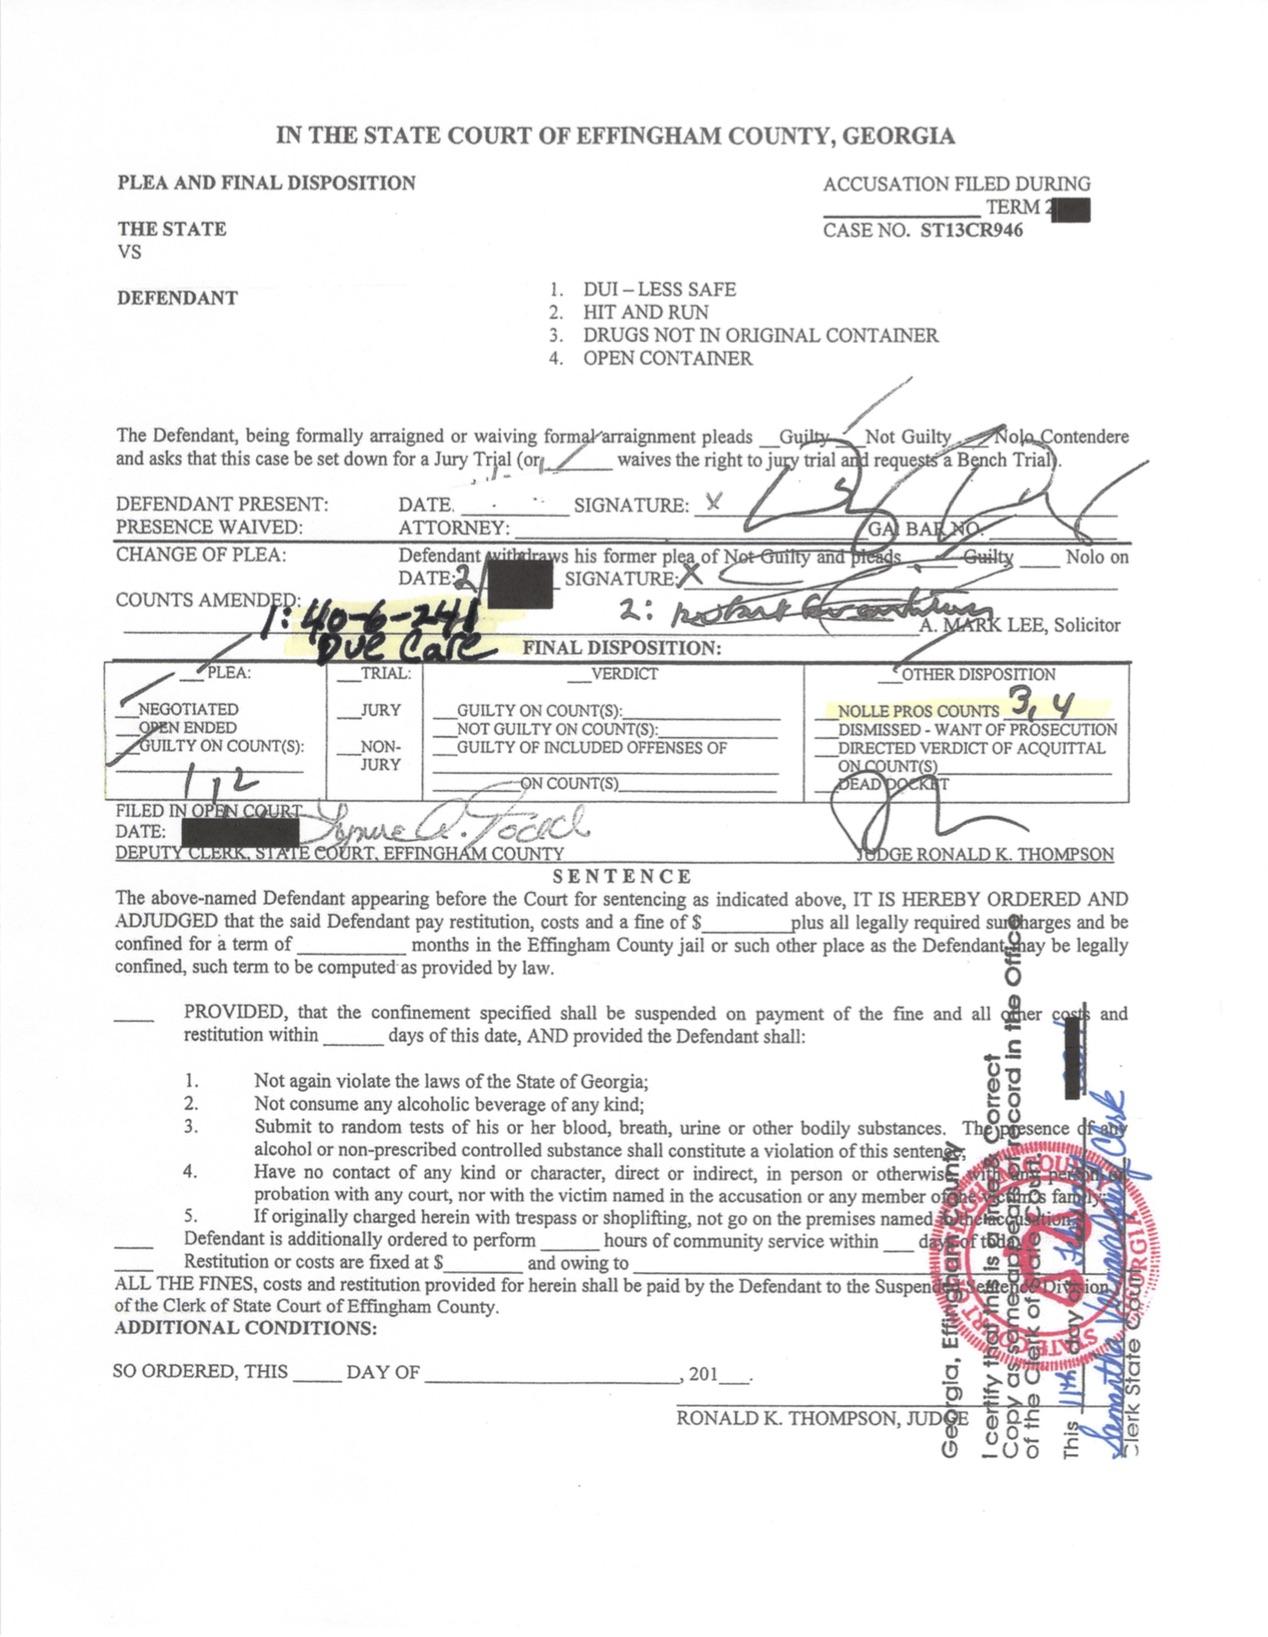 Effingham DUI reduced for Pharmacist - Jason Cerbone, Savannah DUI lawyer